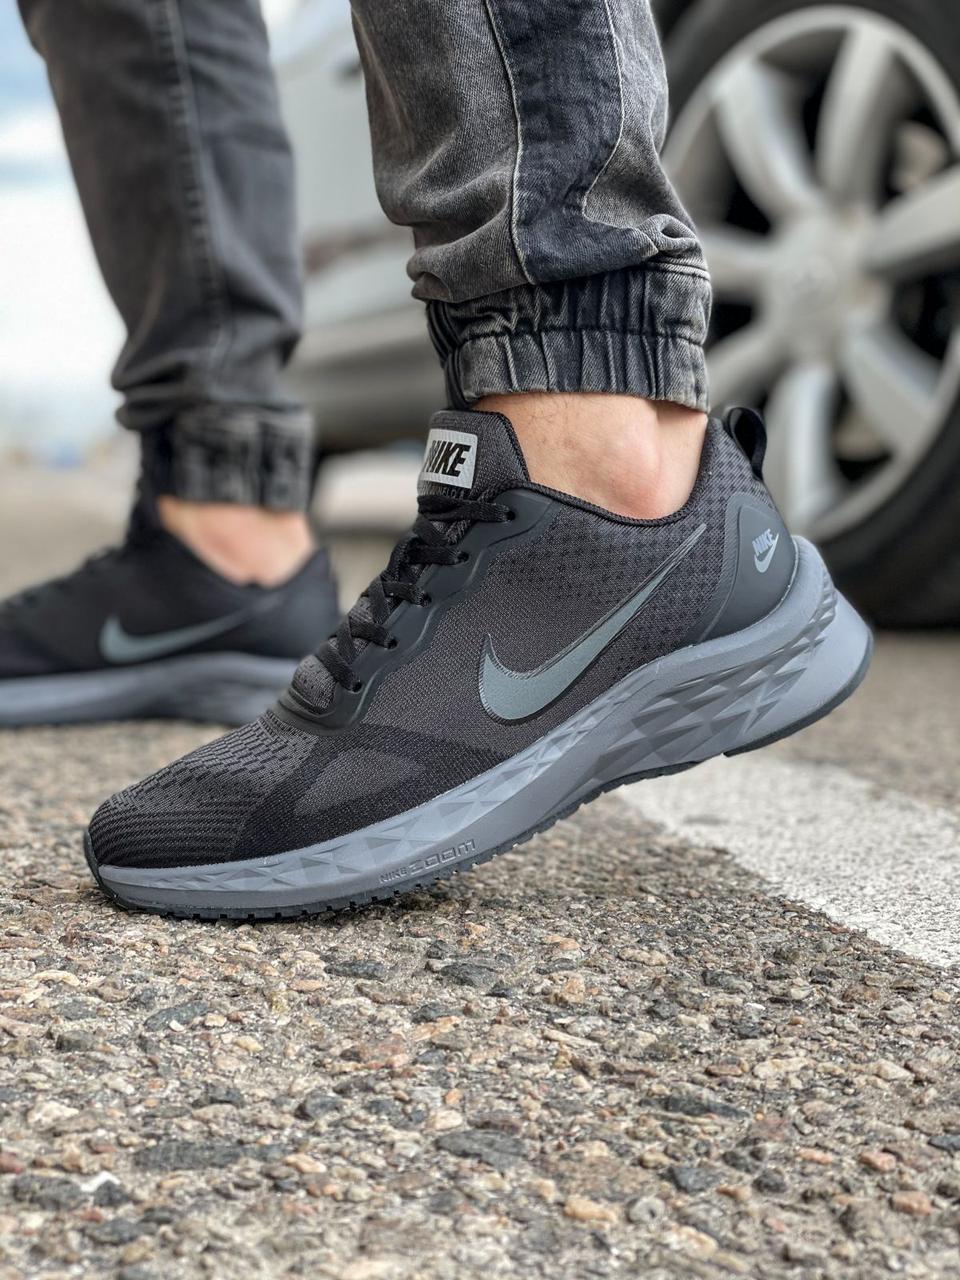 Кроссовки мужские 18471, Nike Zoom Winflo 8 (TOP), темно-серые [ 44 45 ] р.(43-28,0см)